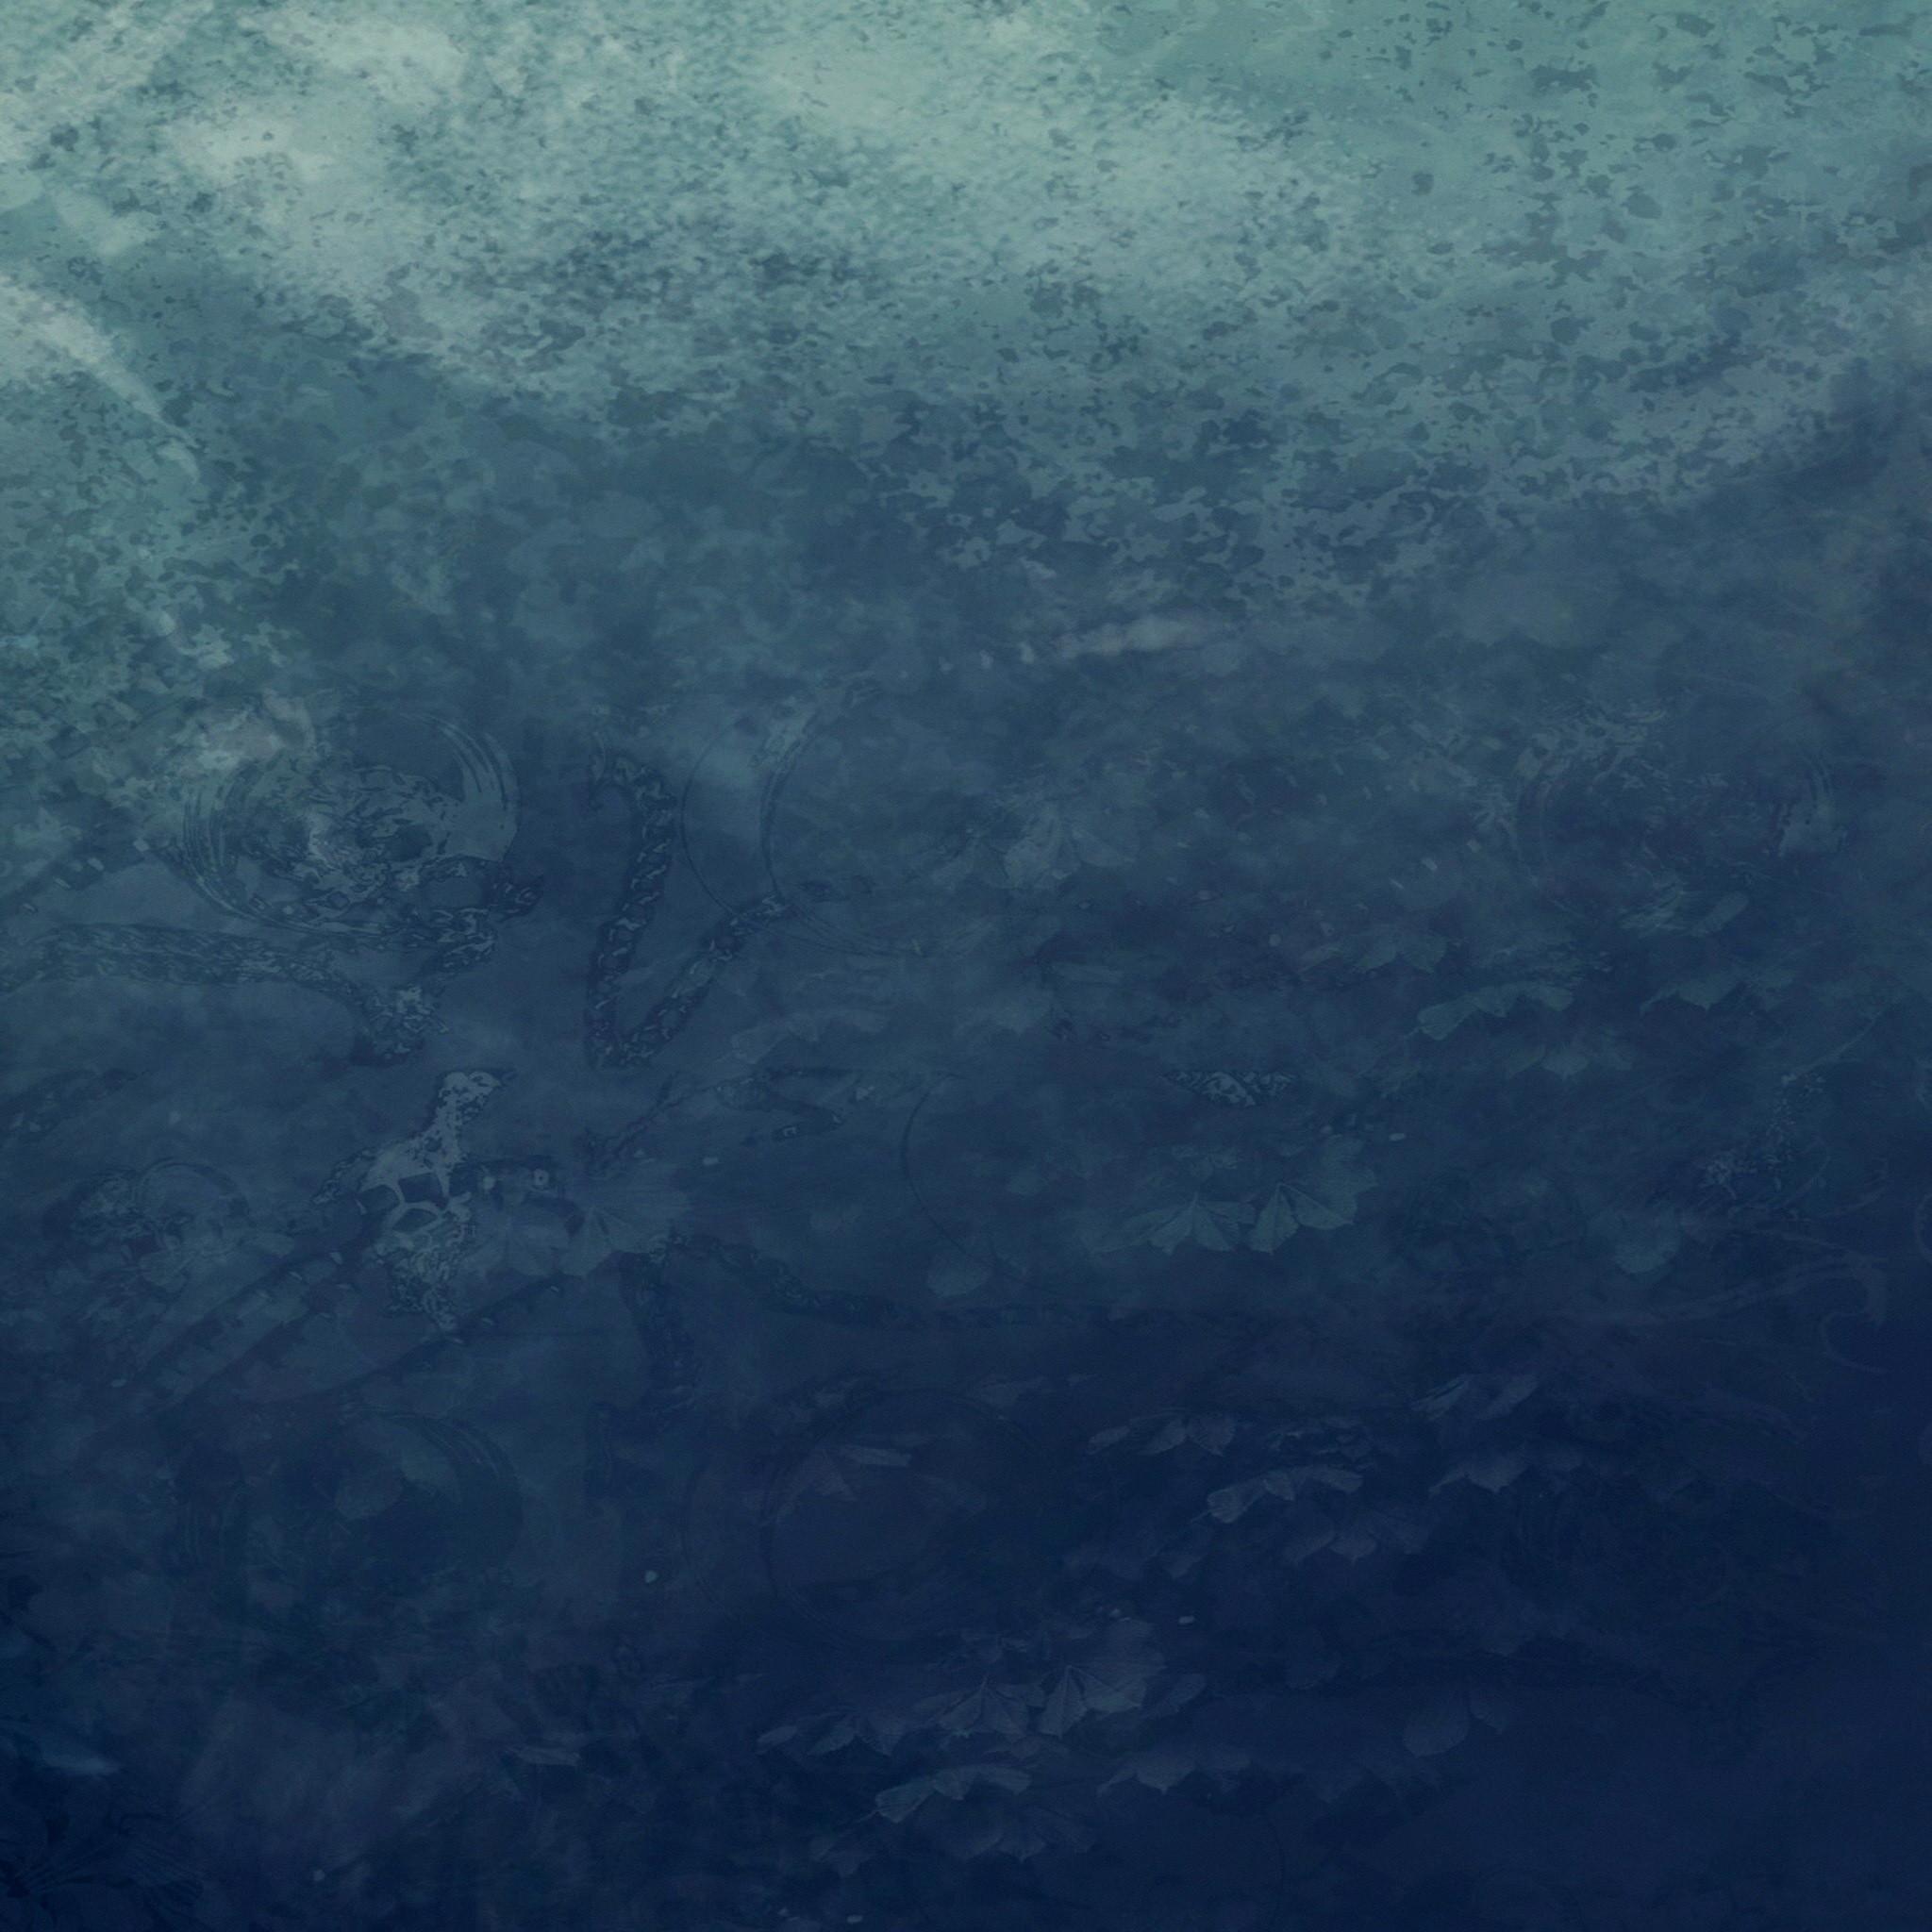 ios 6 wallpaper ipad (63+ images)